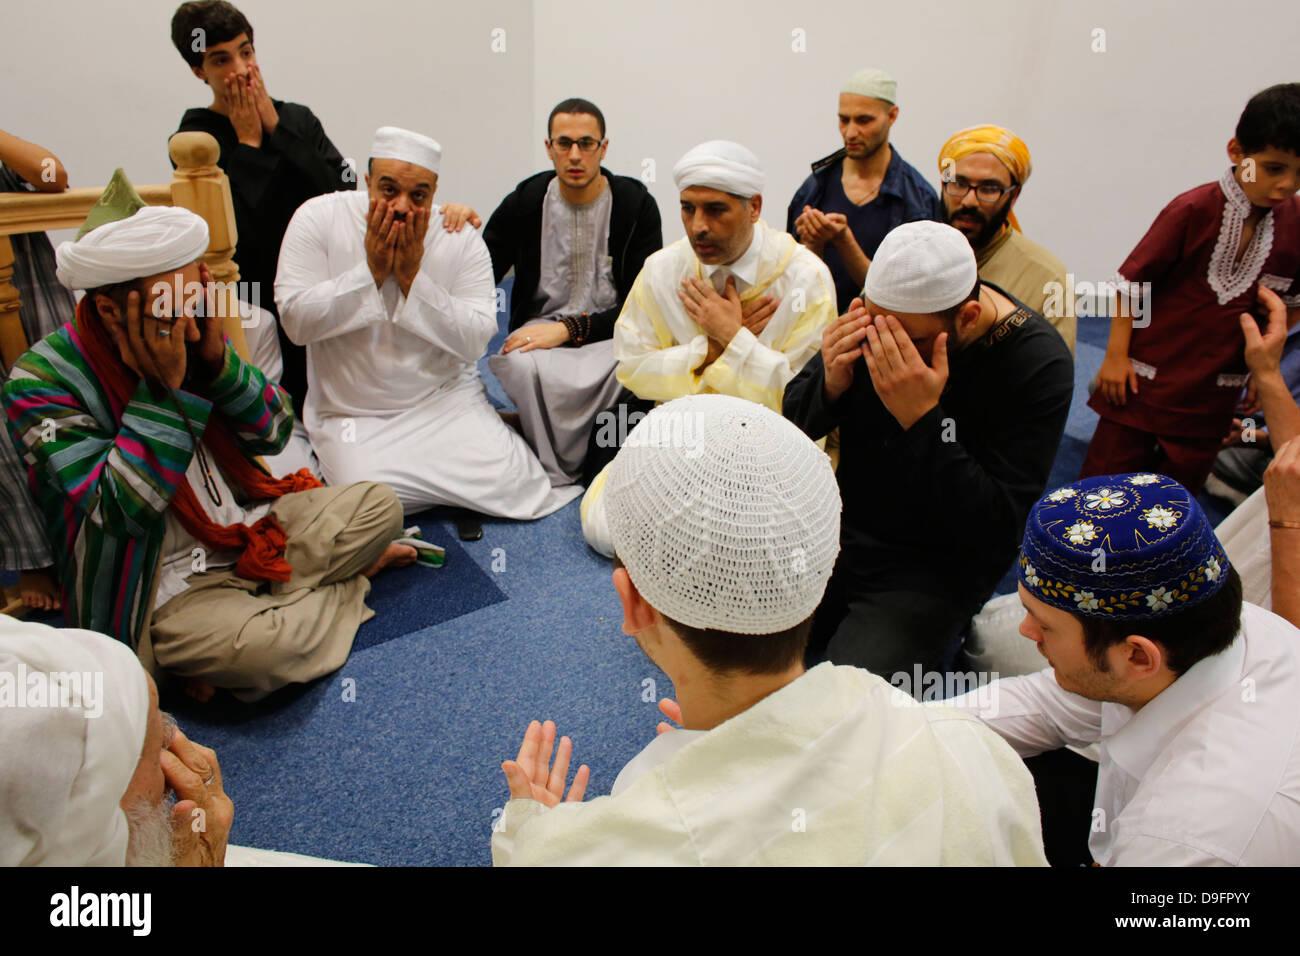 Sufi prayer, Evry, Essonne, France - Stock Image